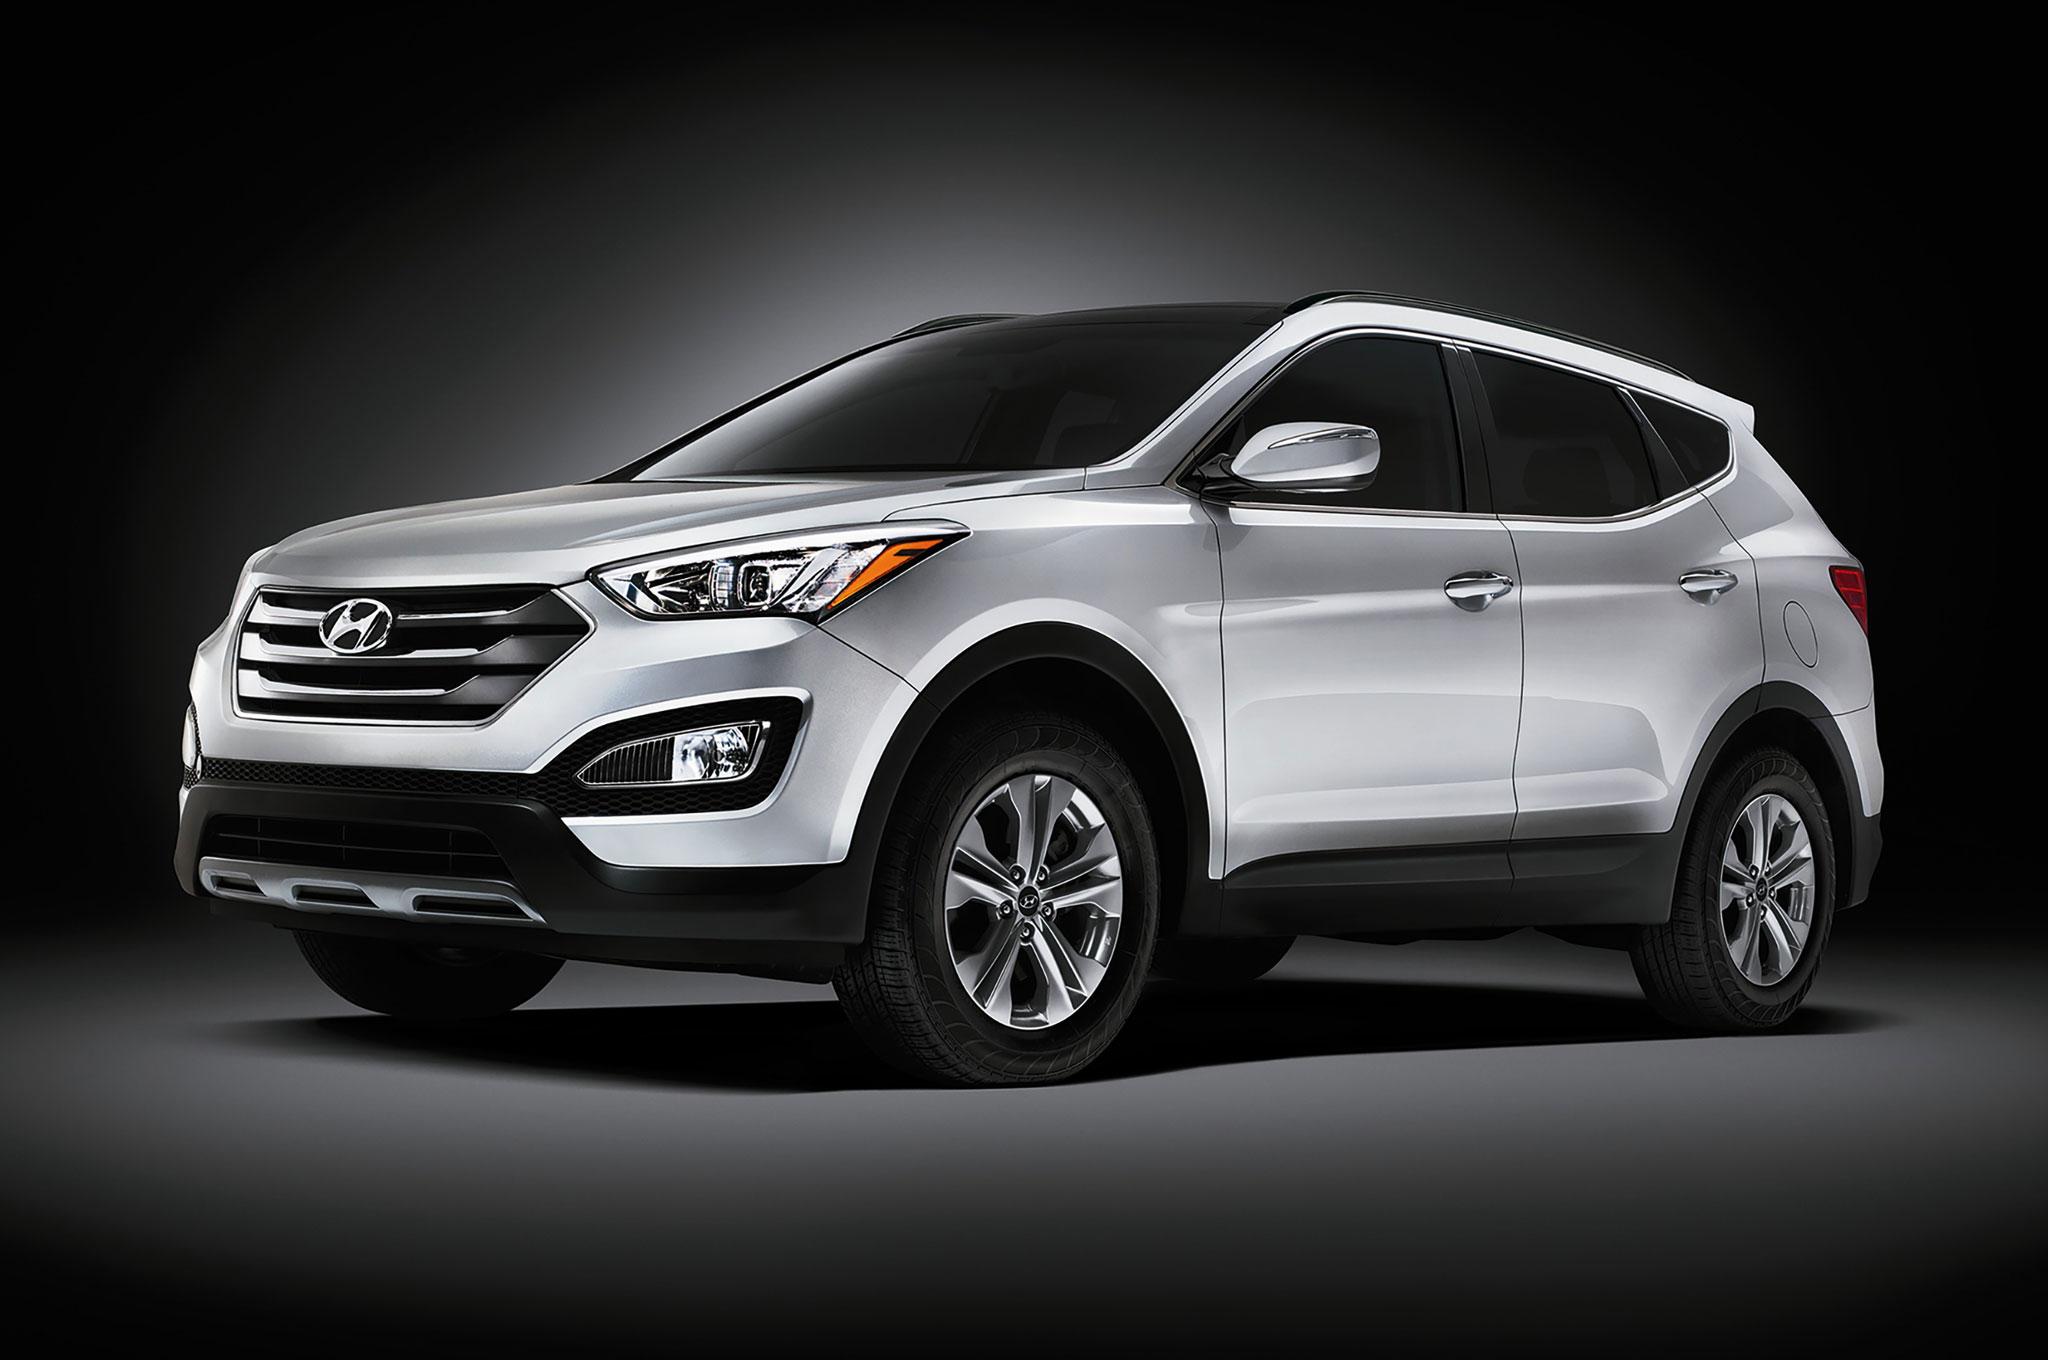 2015 Hyundai Santa Fe, Santa Fe Sport Updated